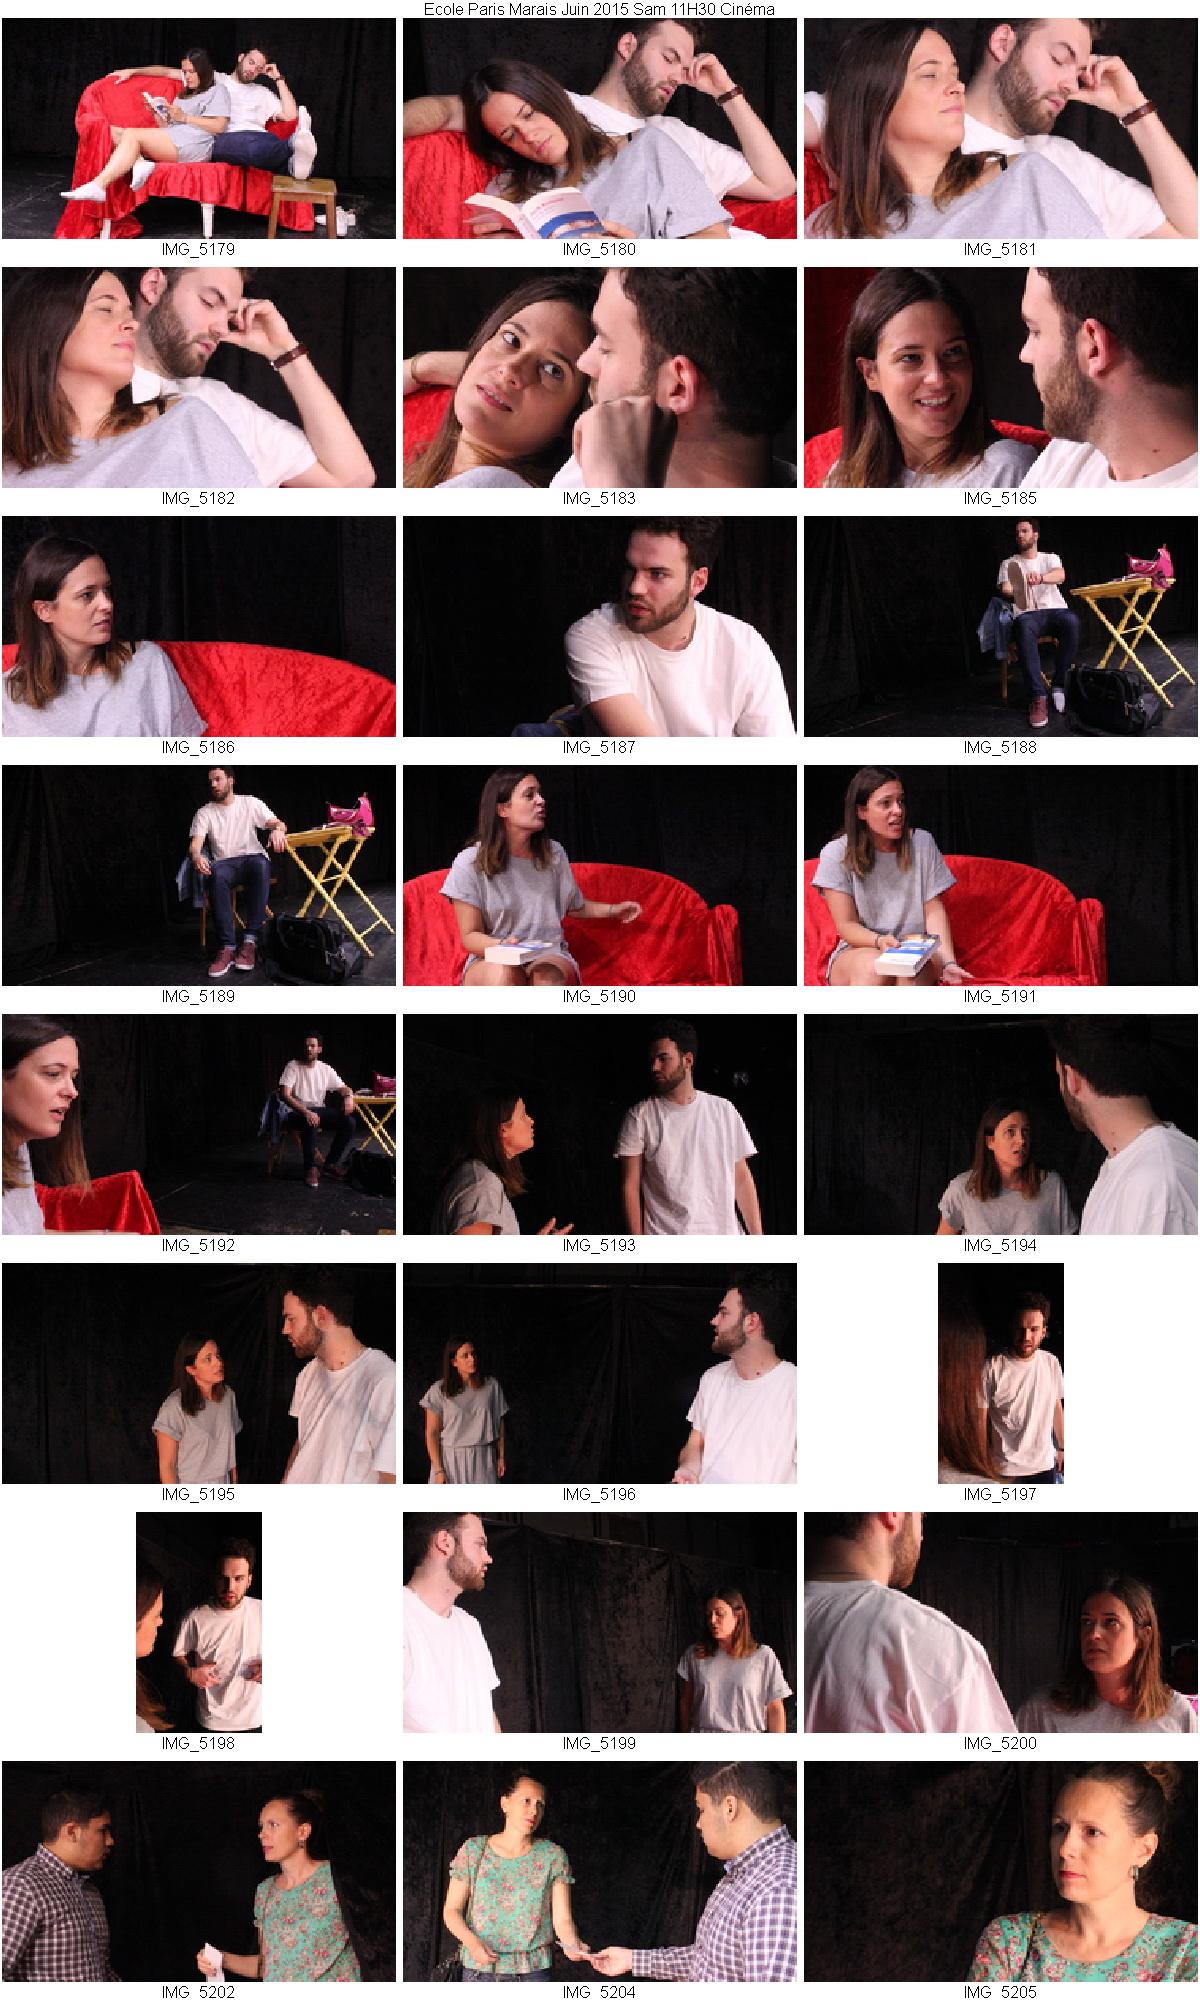 Flickr - planche contact adulte cine juin 2015